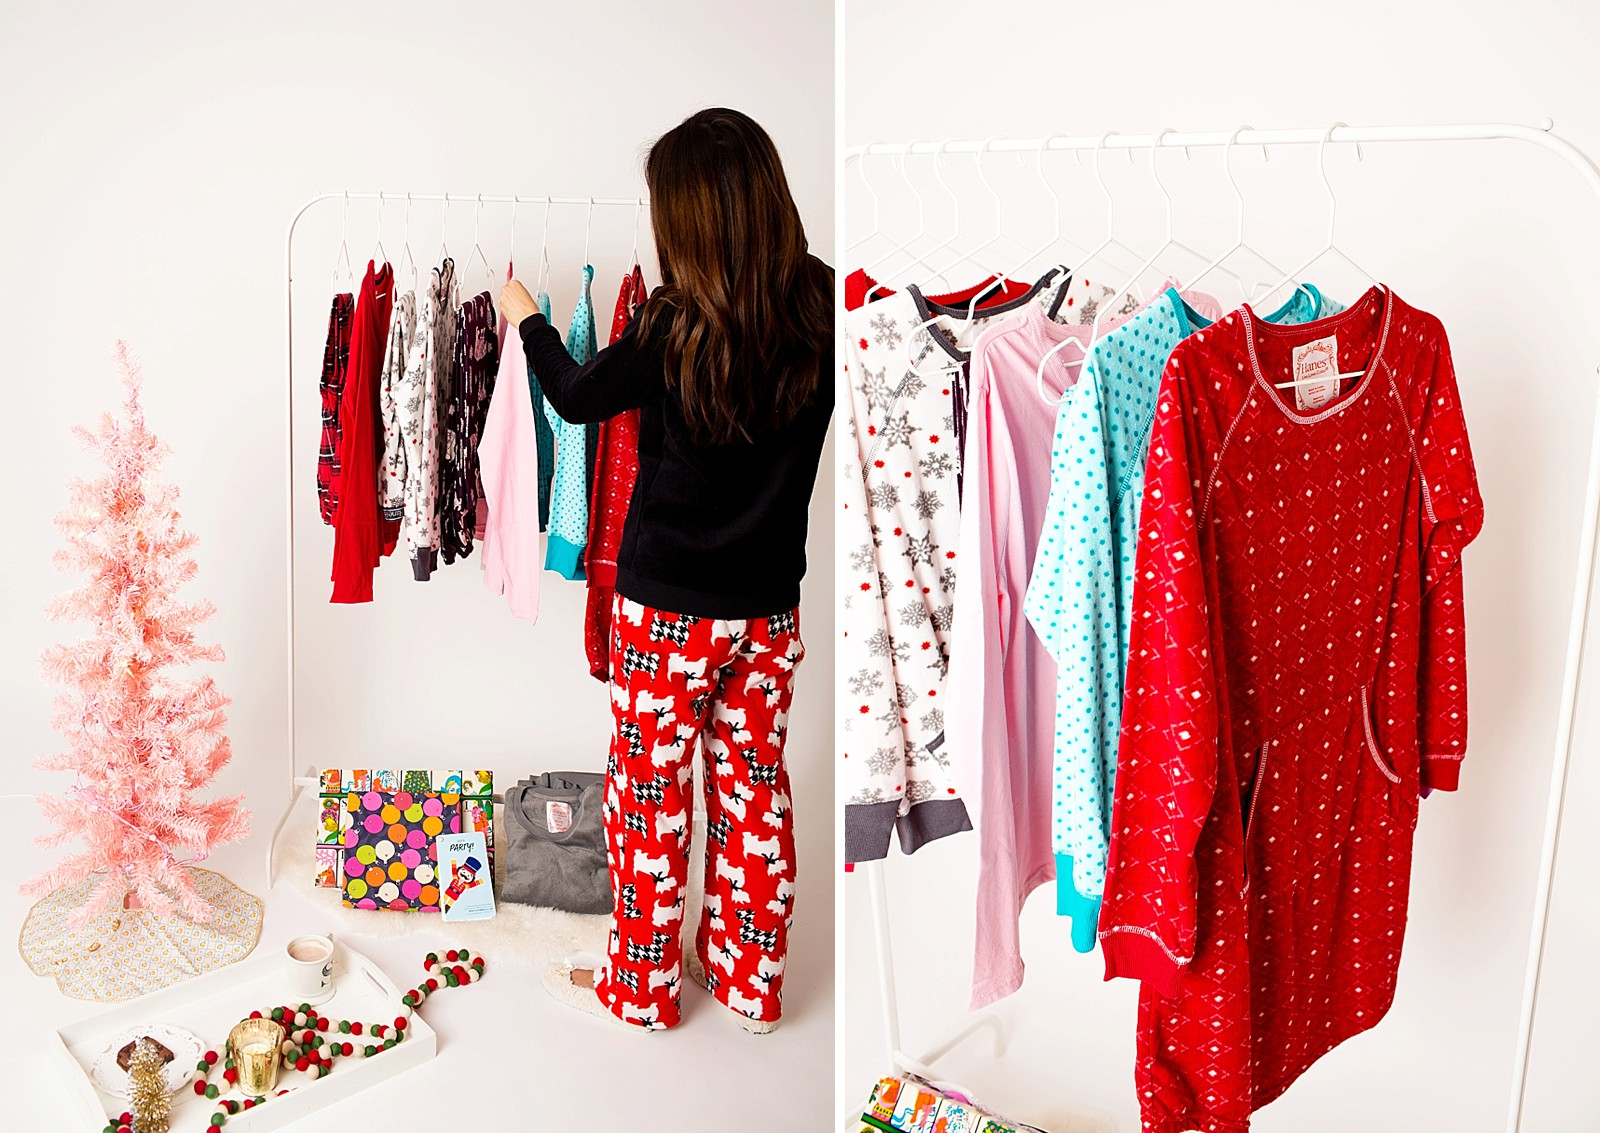 hanes-christmas-pajamas-girls-pajama-party-ideas-cute-jammies-diana-elizabeth-lifestyle-fashion-blogger-phoenix-arizona-1769